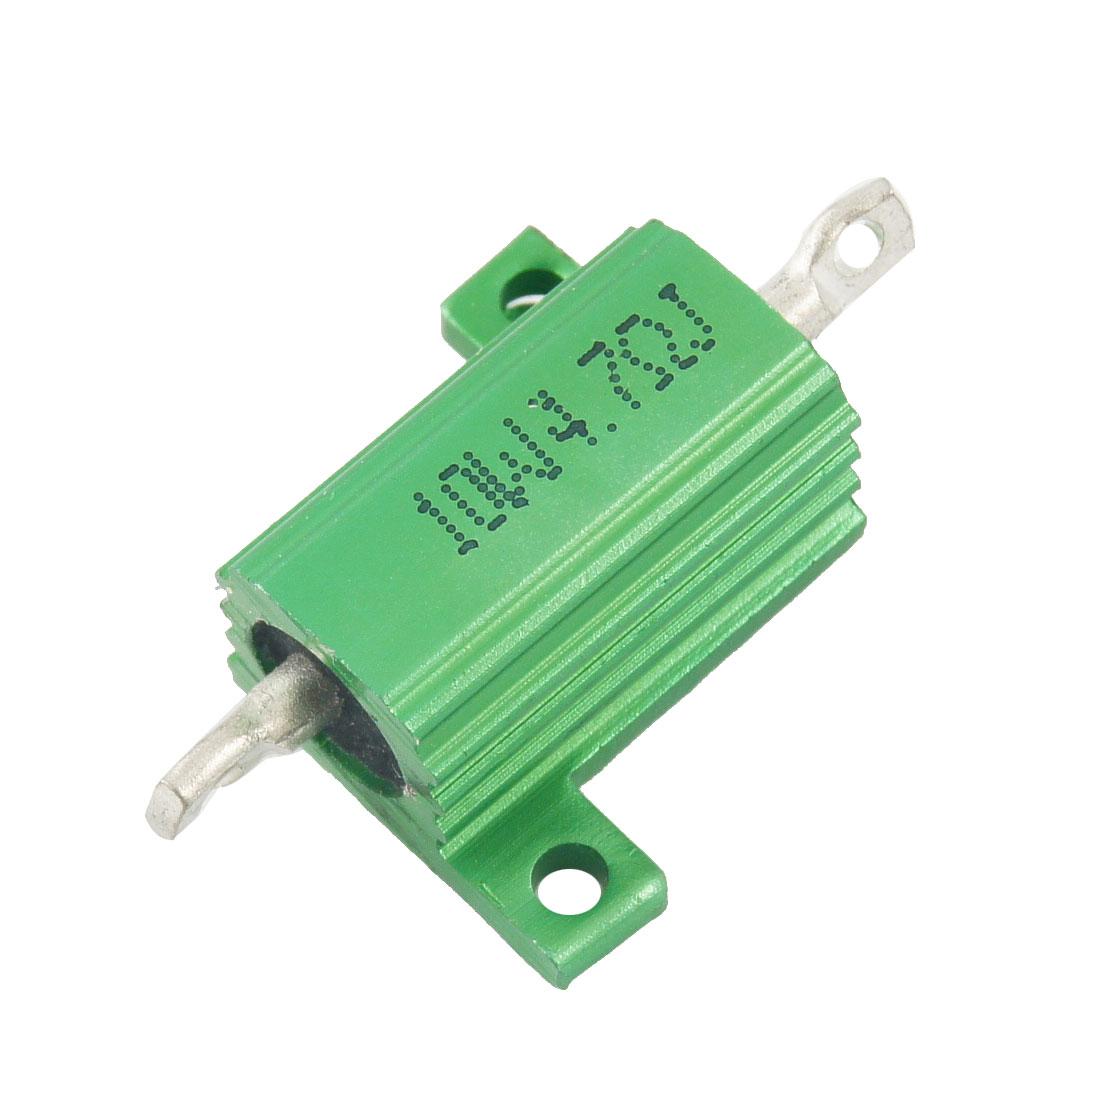 Green 10 Watt 4.7 Ohm 5% Aluminum Shell Wire Wound Resistor